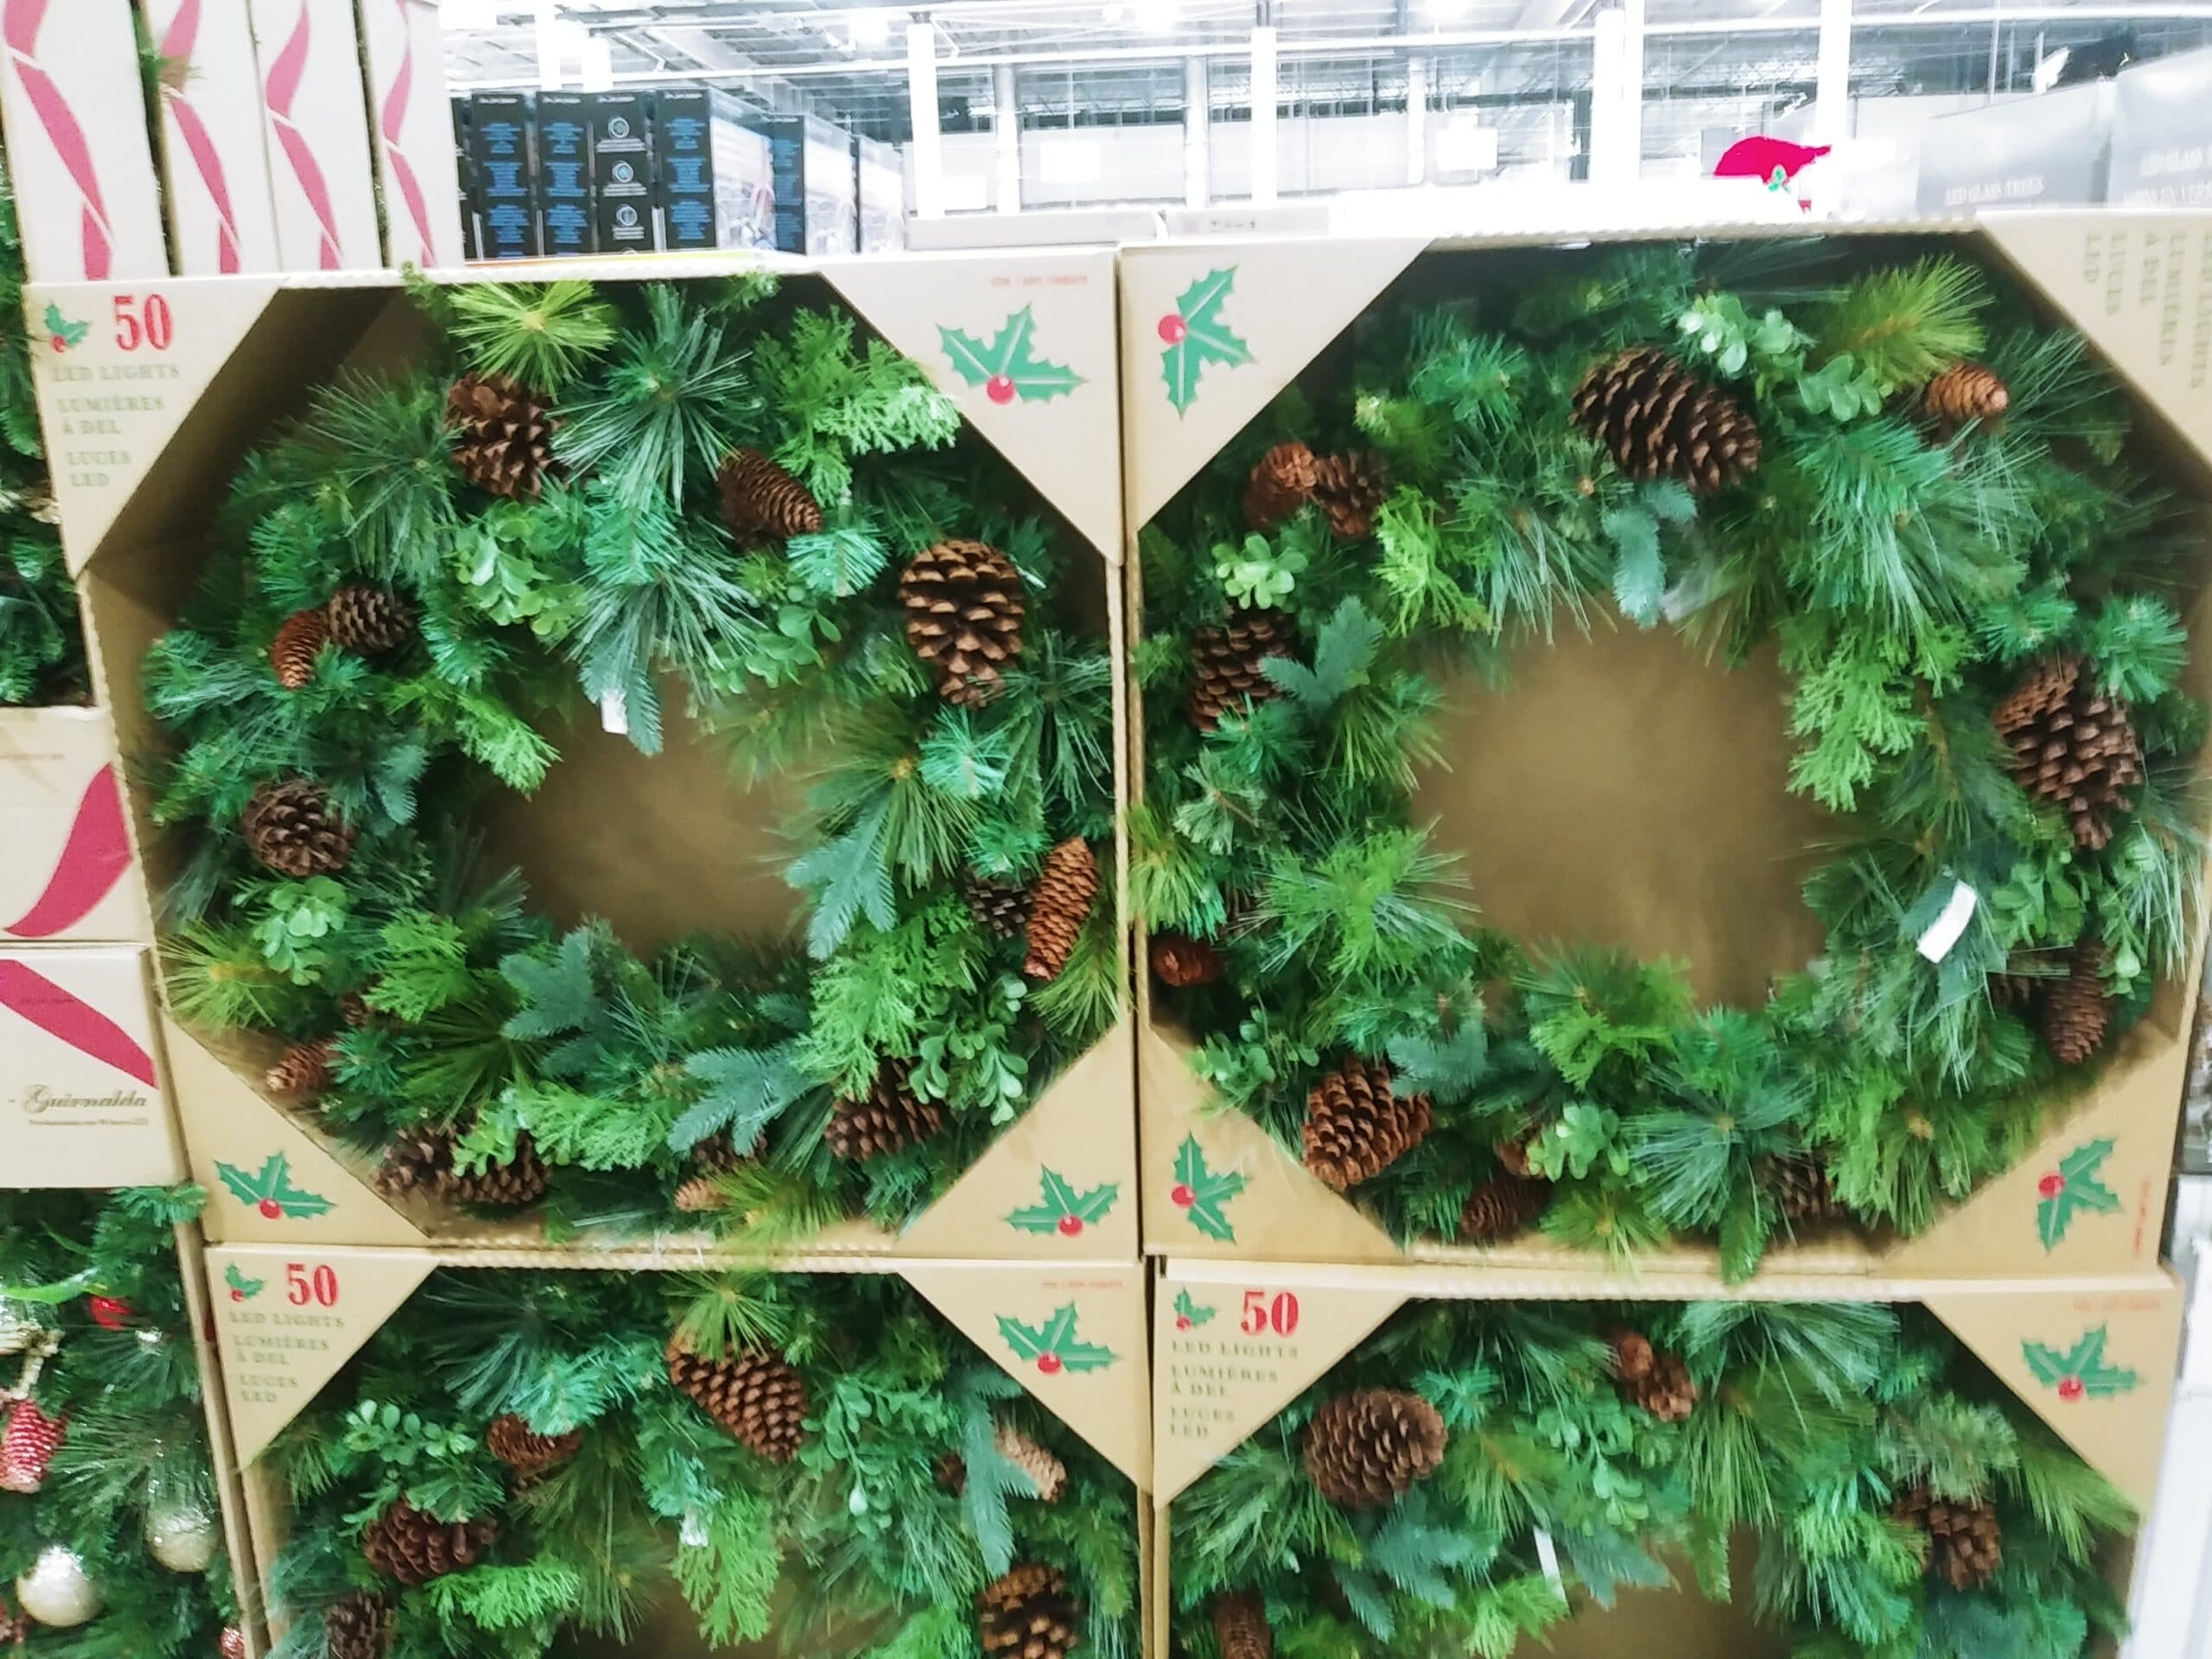 32 Inch Greenery Wreath $44.99